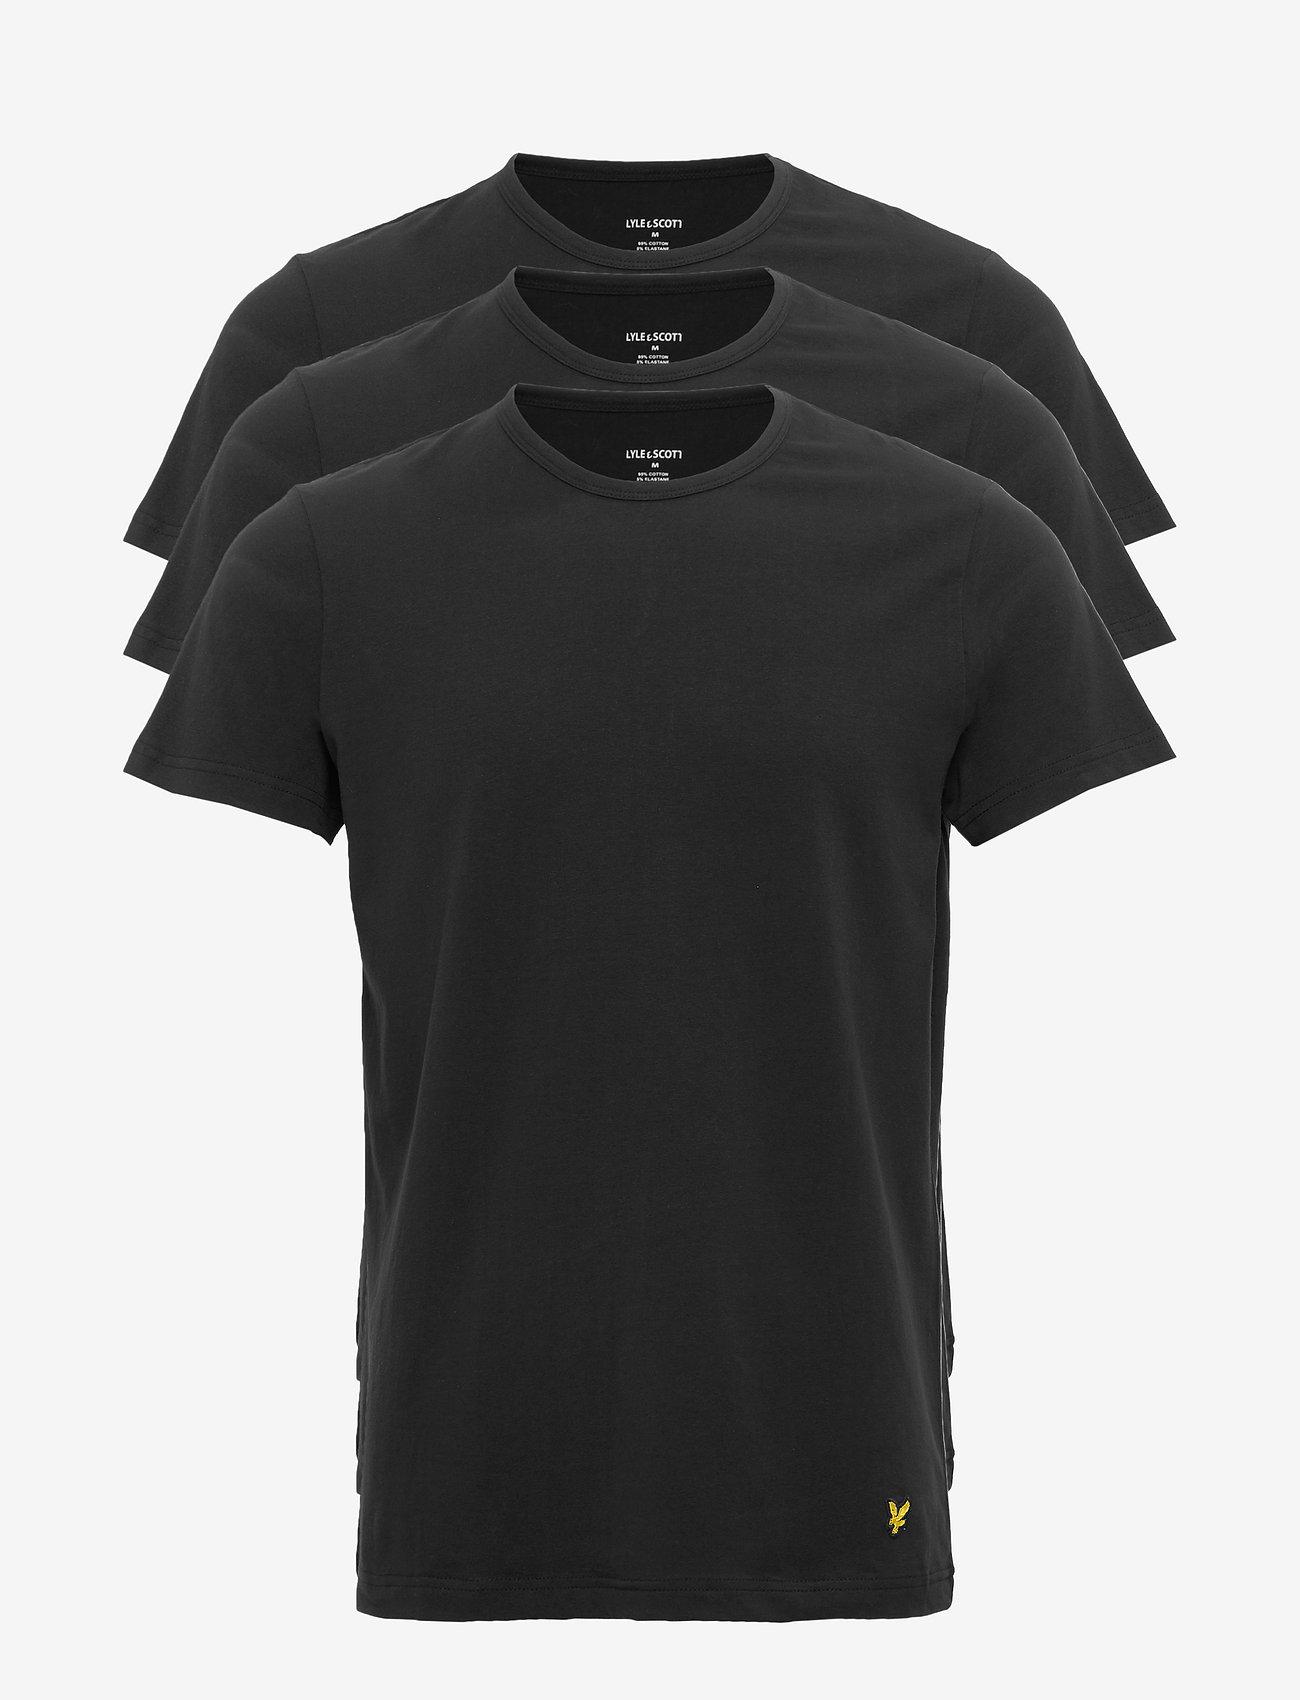 Lyle & Scott - MAXWELL - t-shirts basiques - black - 0